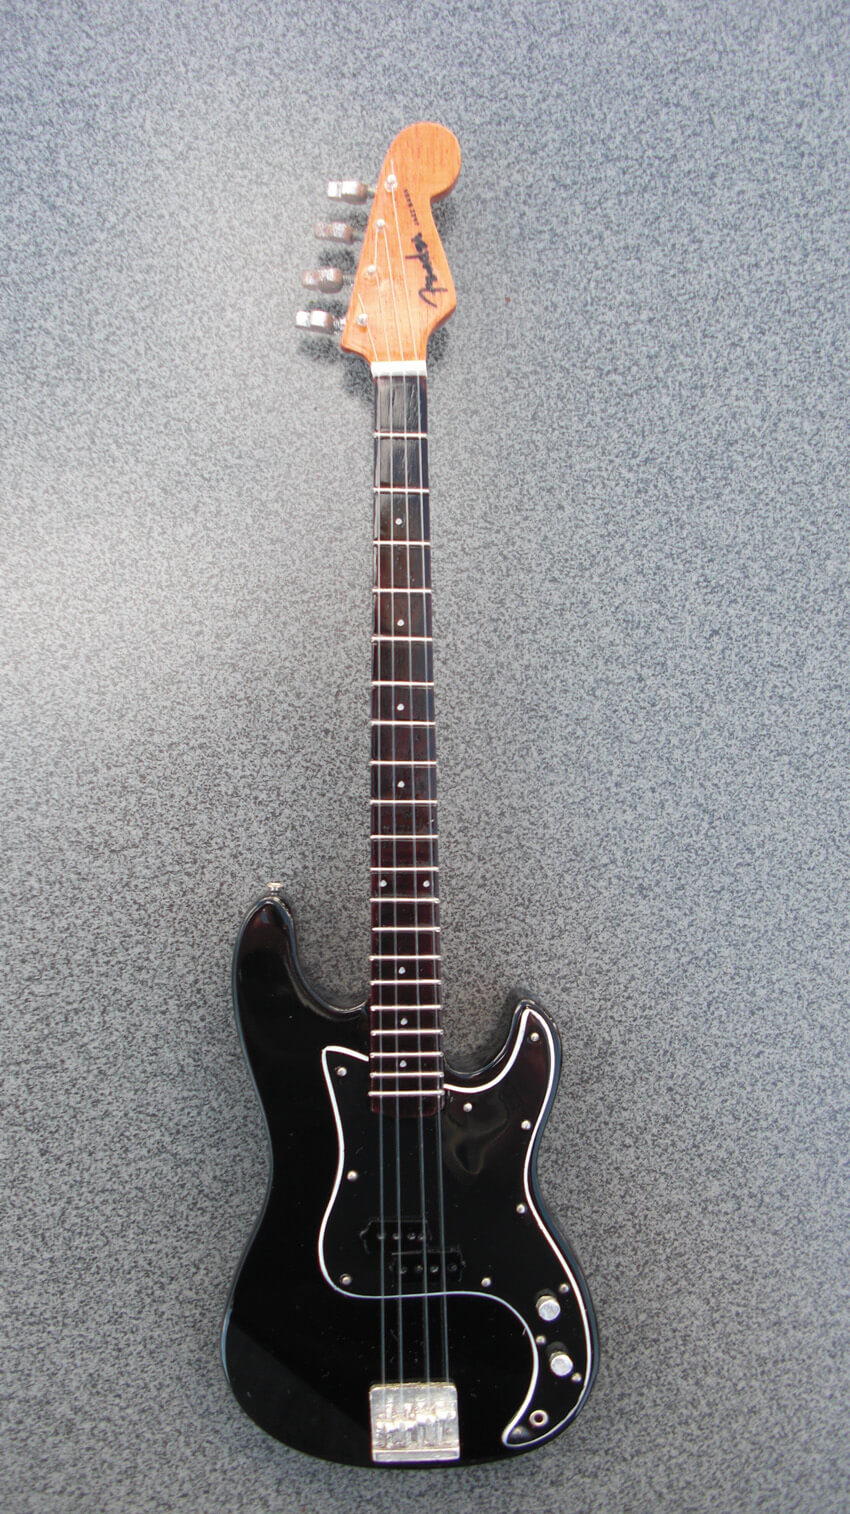 RGM44 Phil Lynott Thin Lizzy Miniature Guitar